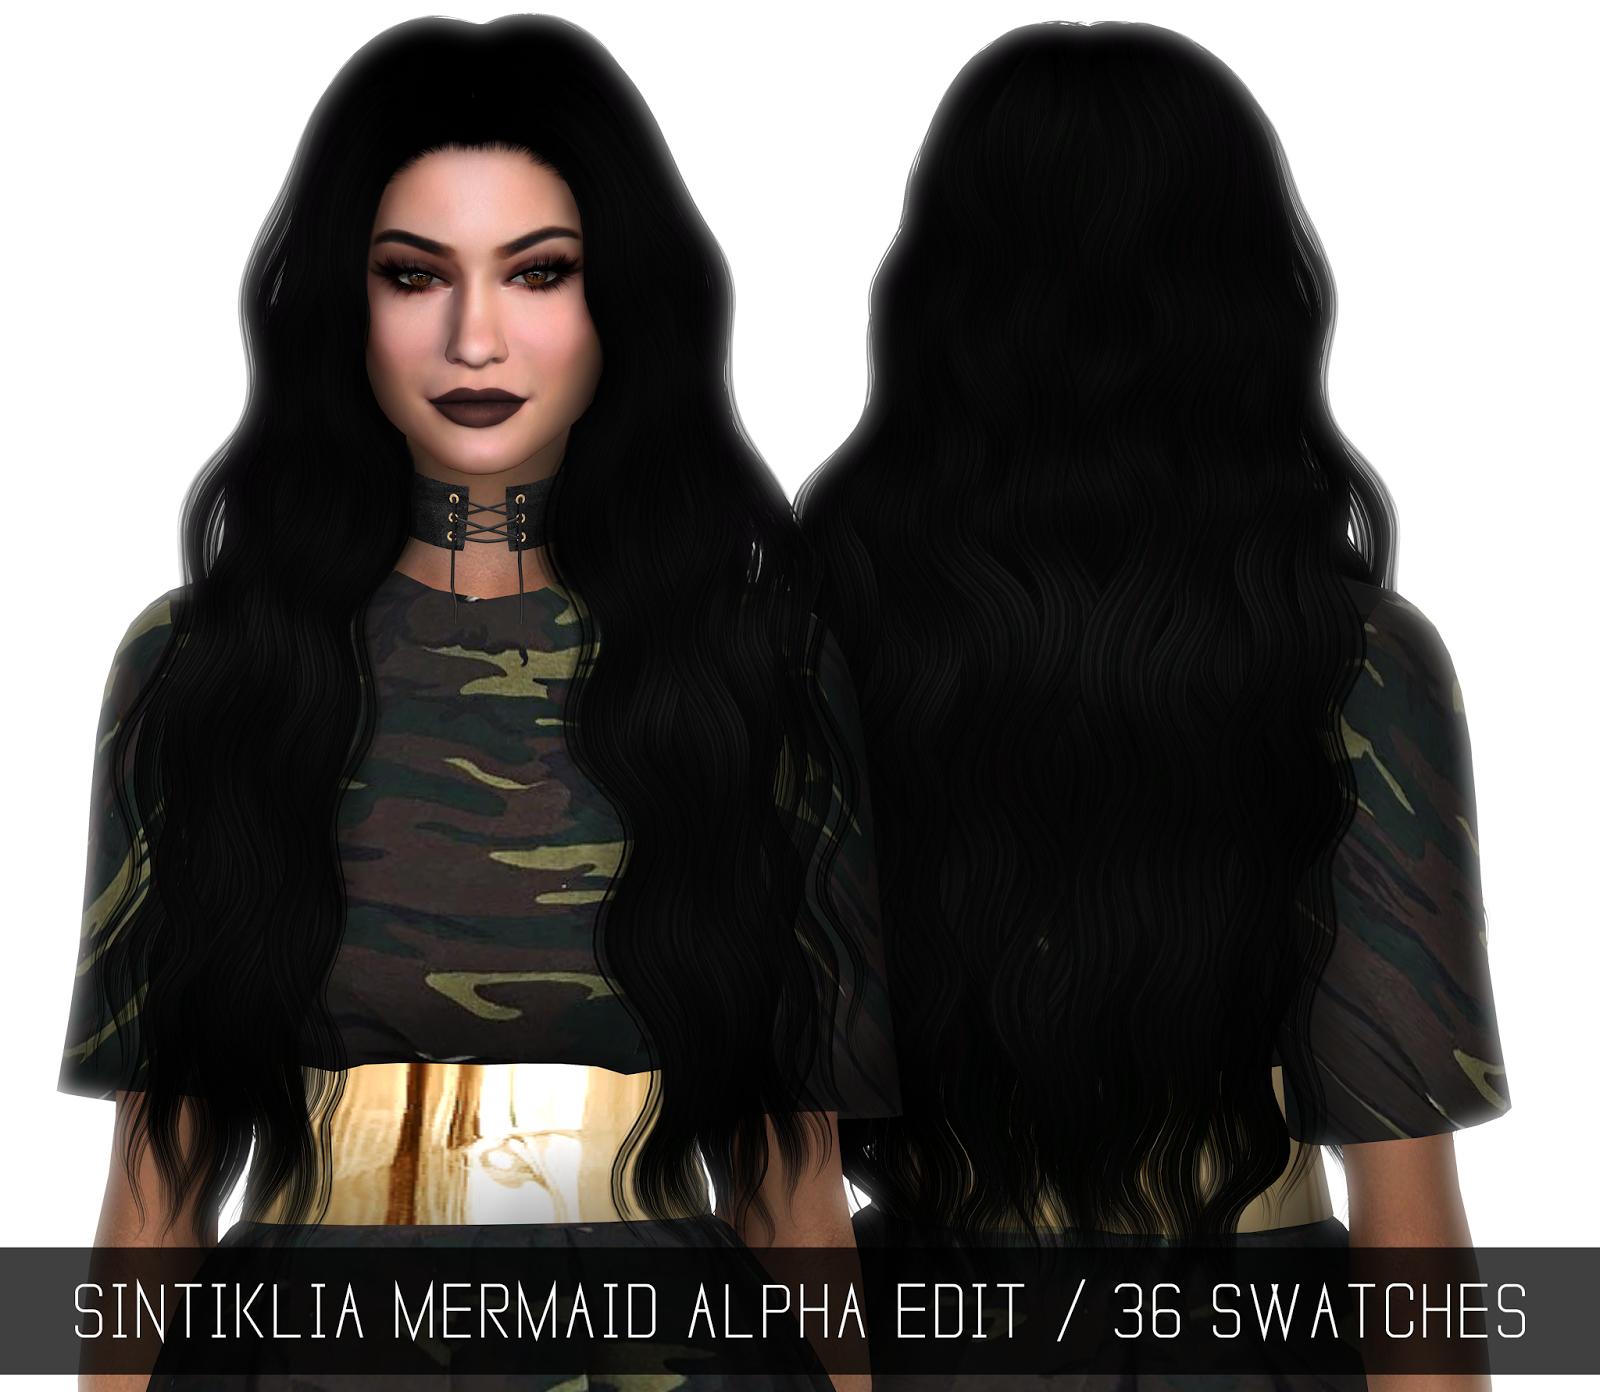 Sintiklia Mermaid Alpha Edit Simpliciaty